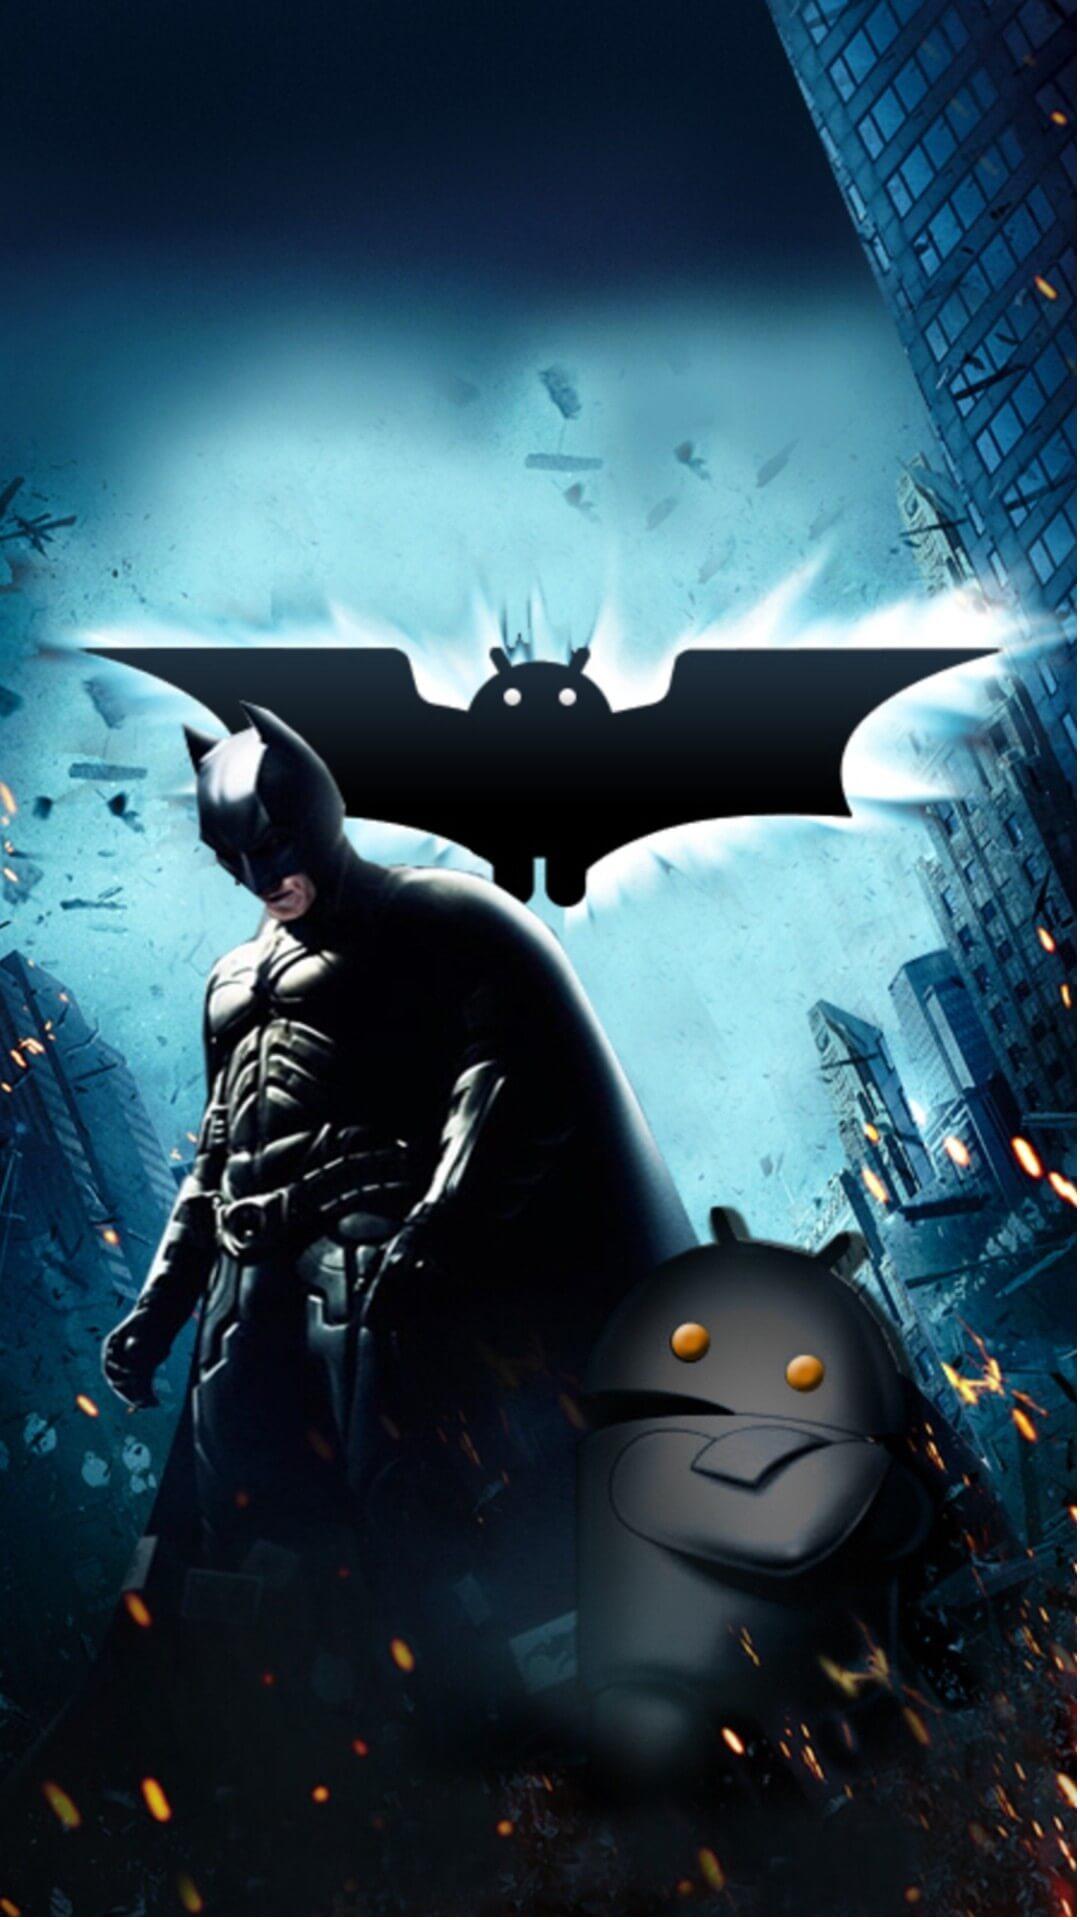 Messi Full Hd Wallpaper Hd Wallpapers Batman Iphone Pixelstalk Net